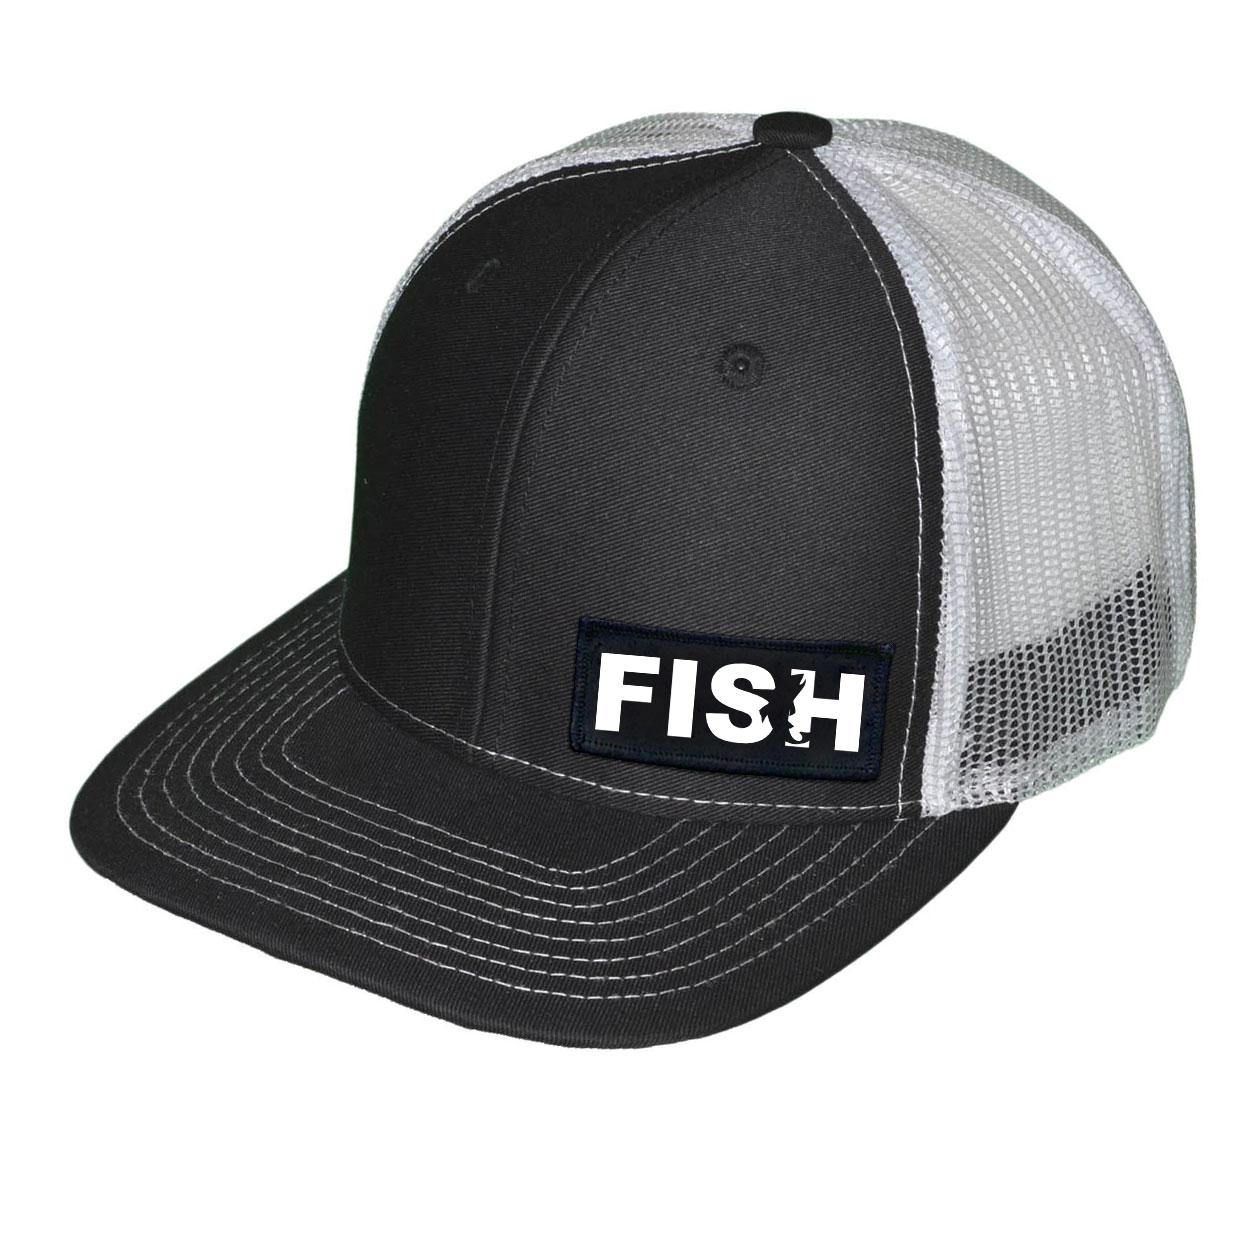 Fish Catch Logo Night Out Woven Patch Snapback Trucker Hat Black/White (White Logo)